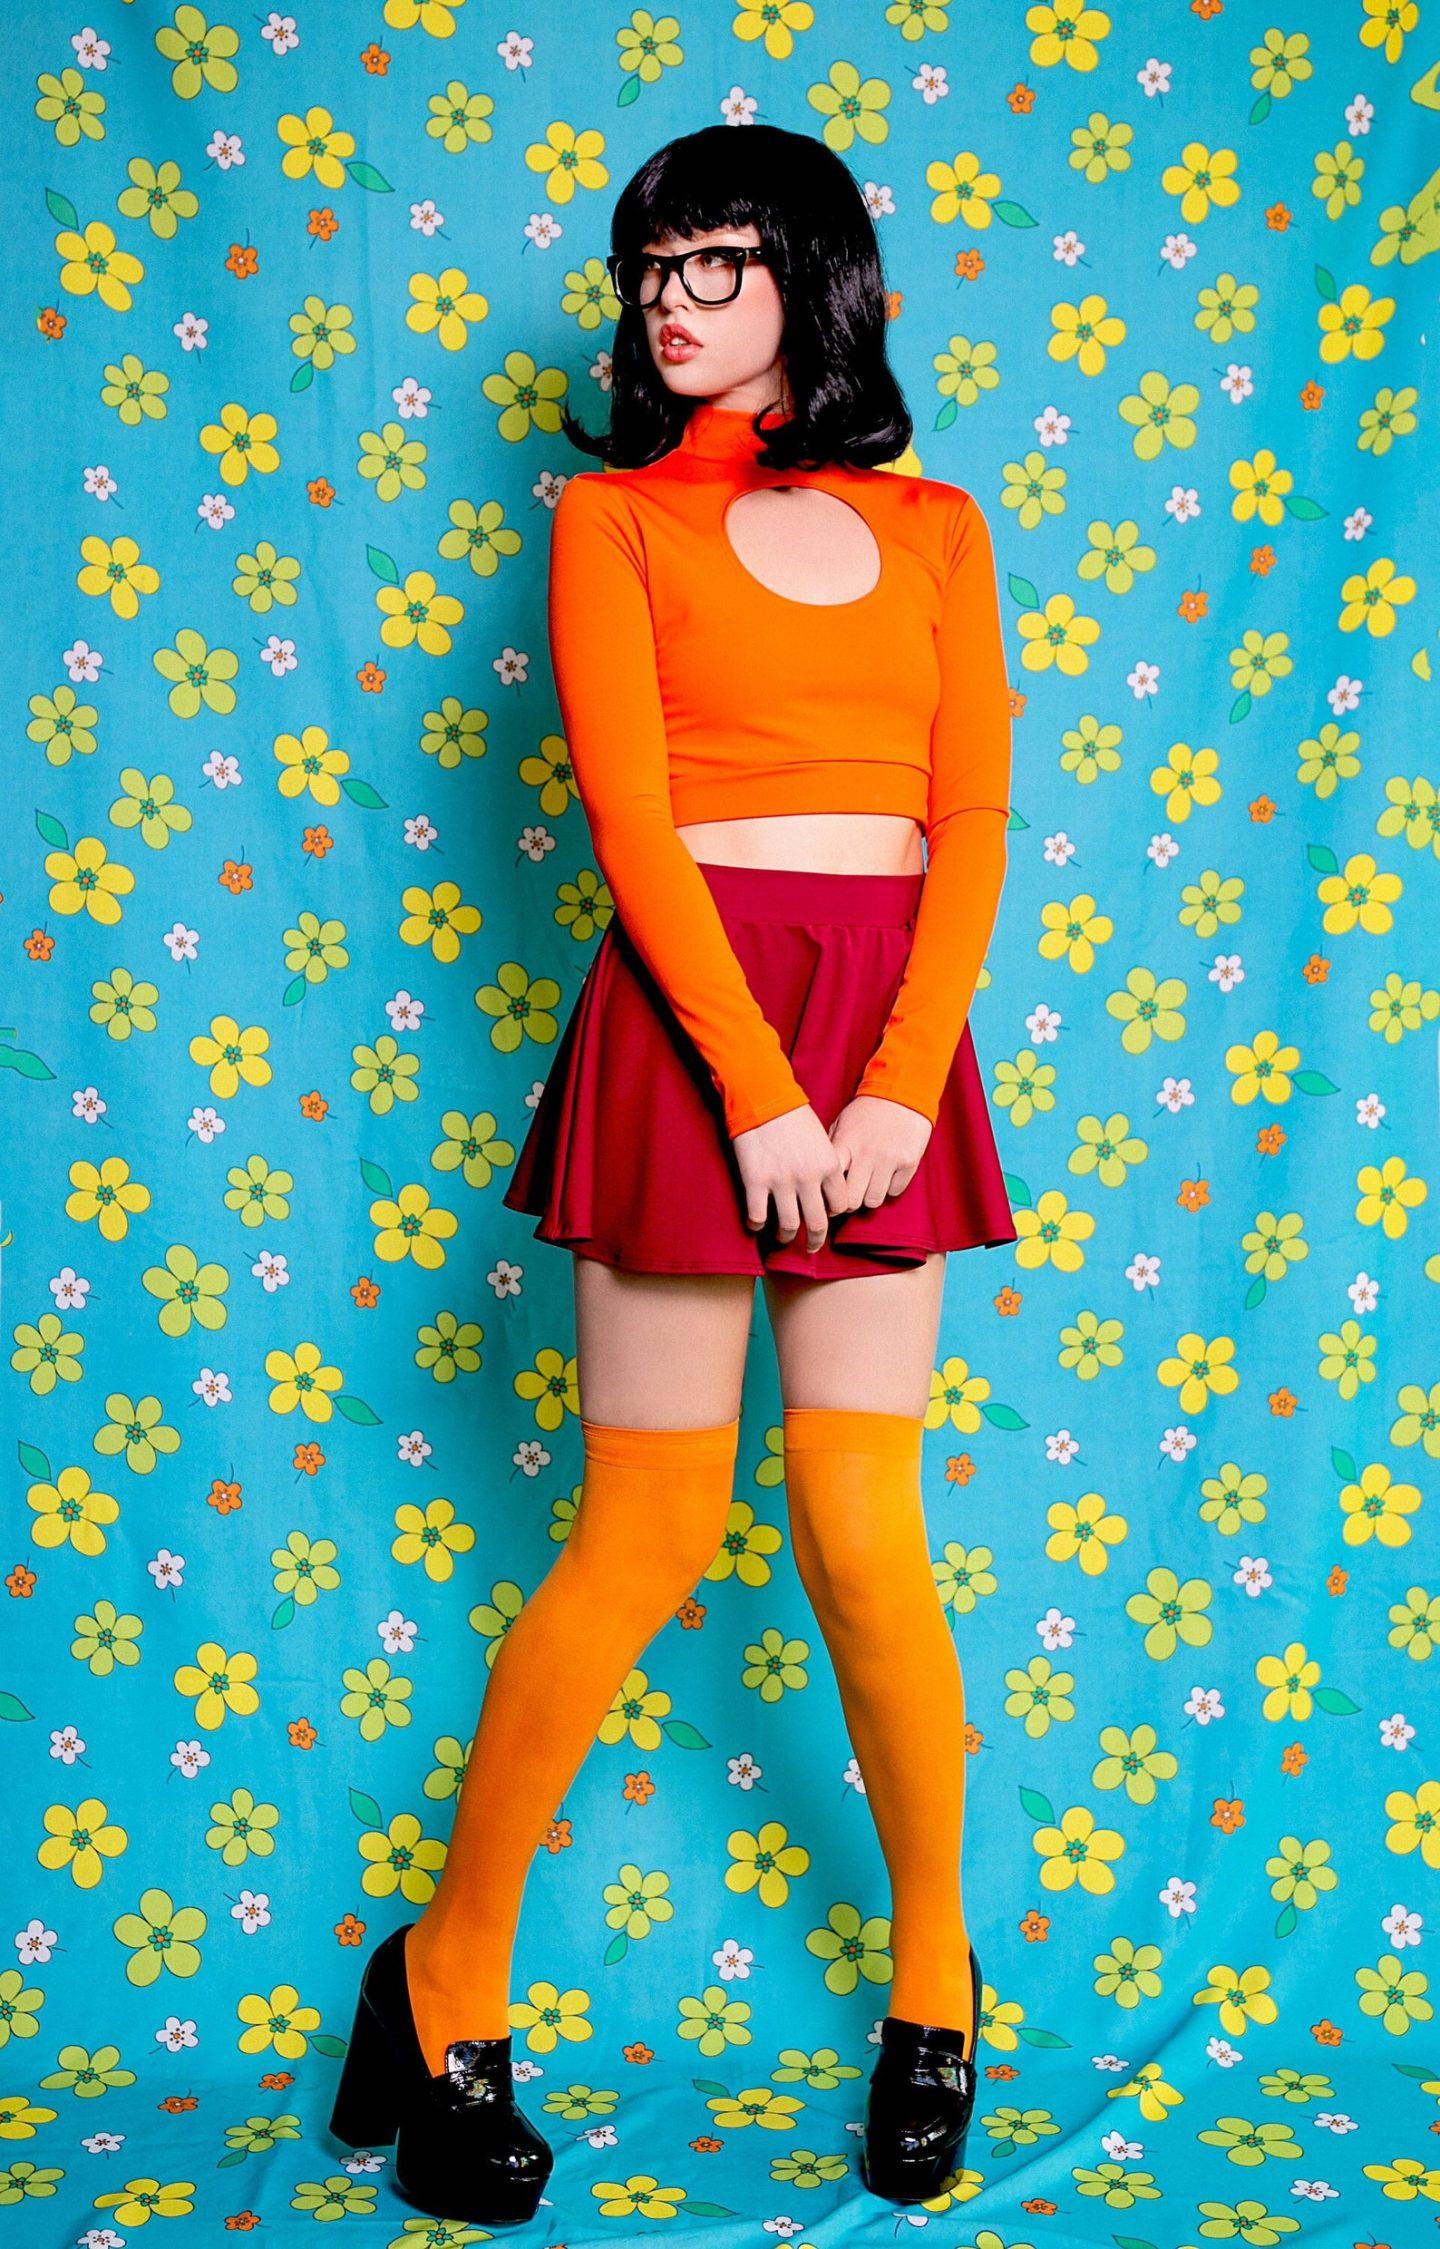 Hot Velma Halloween costume for women